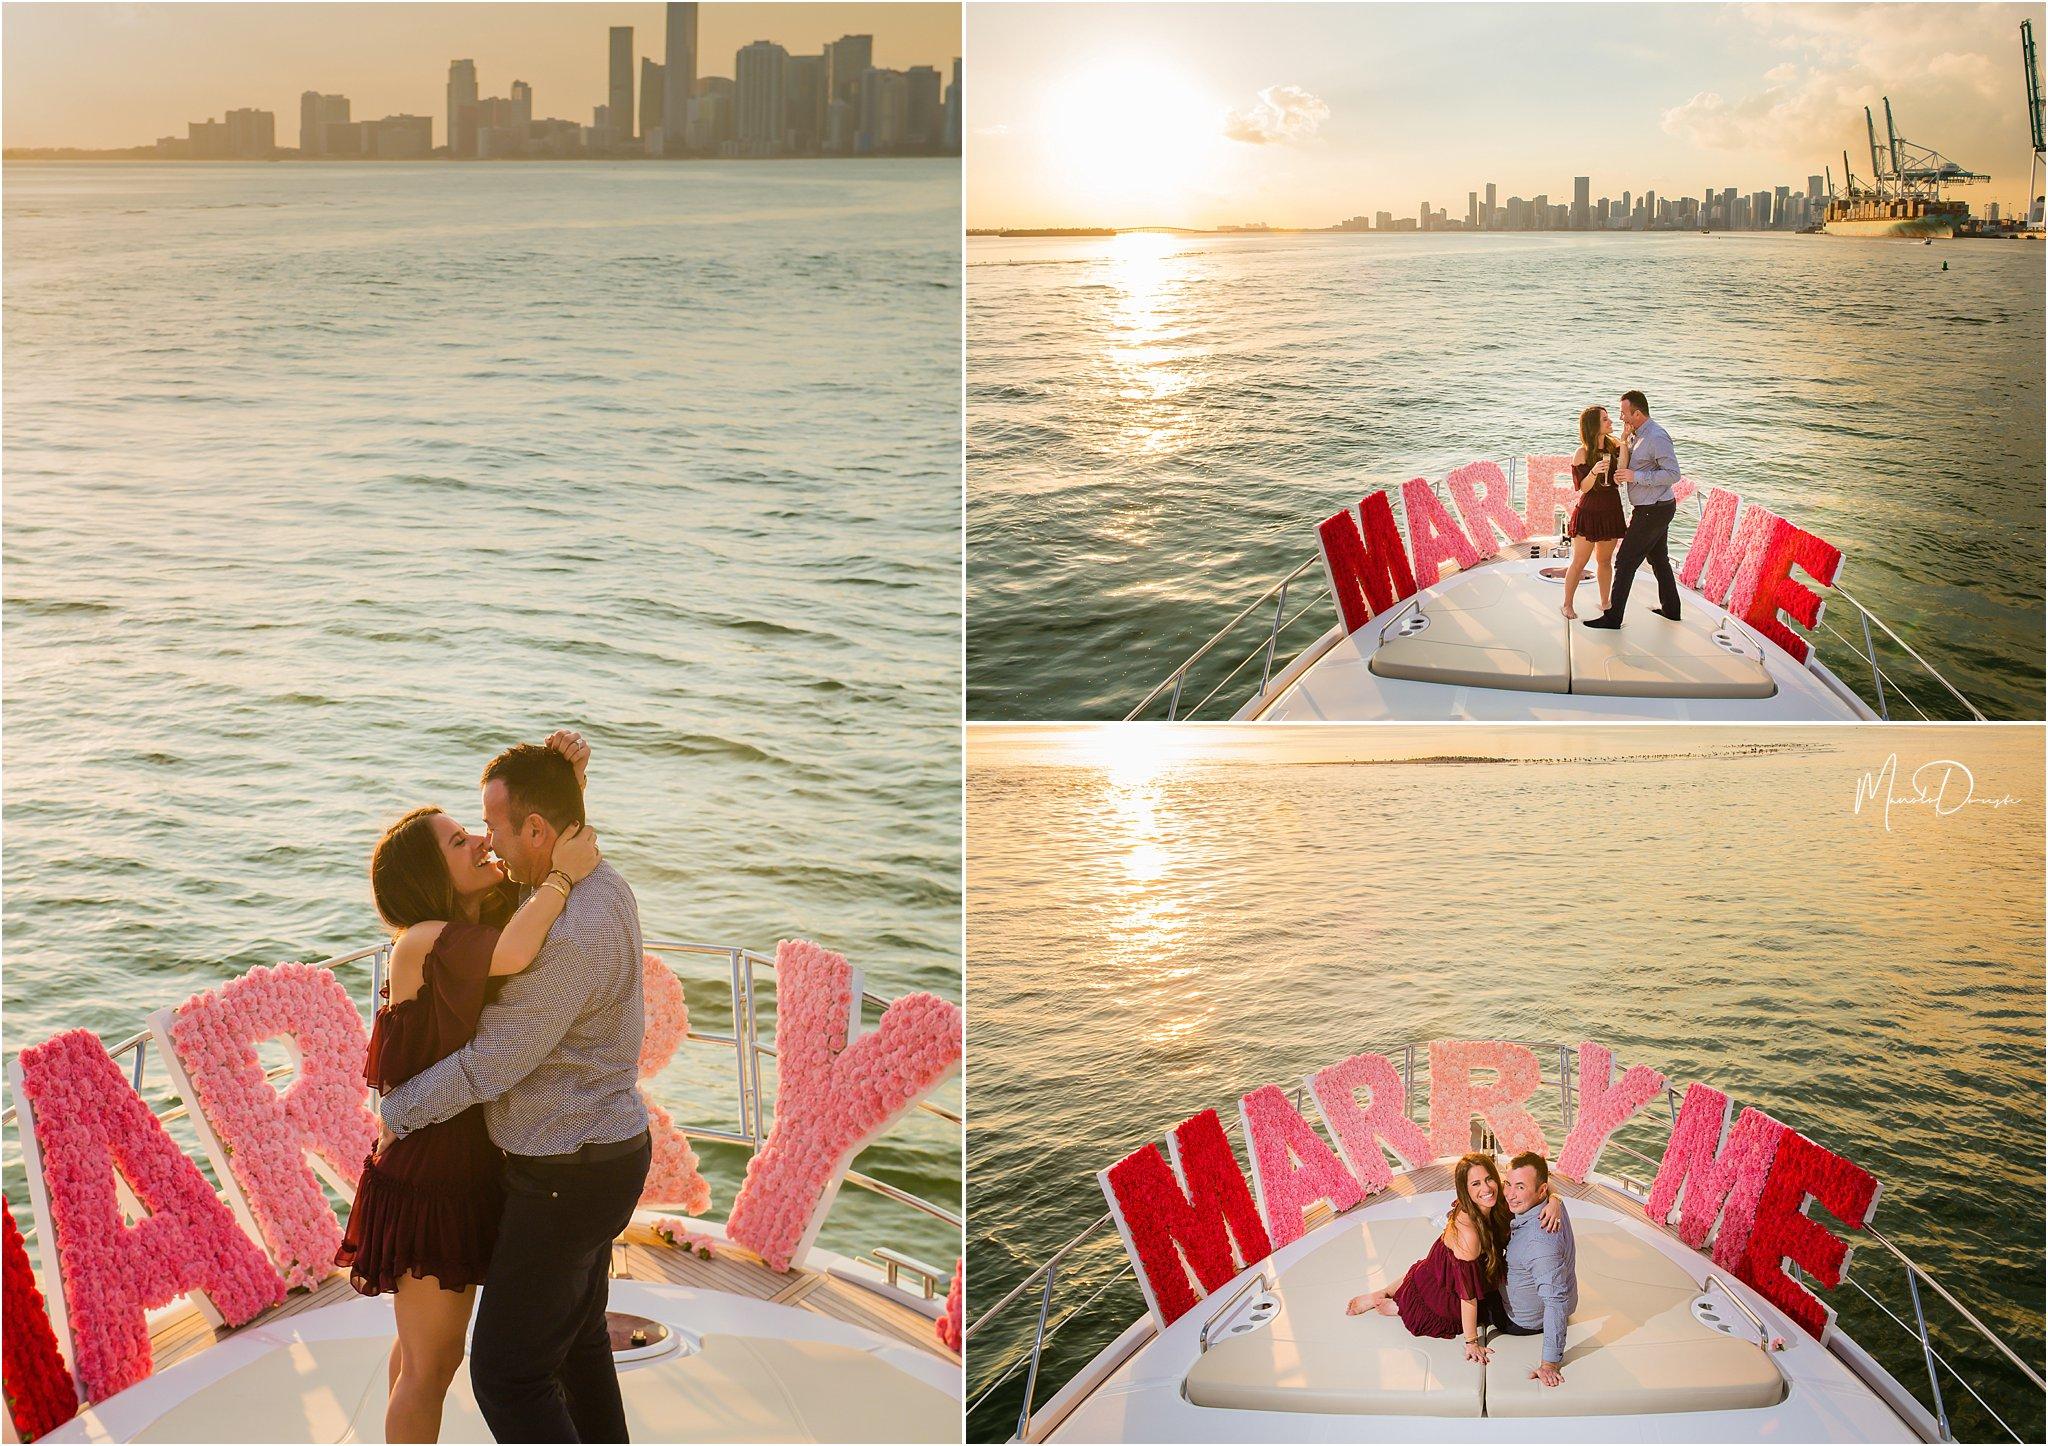 0012_ManoloDoreste_InFocusStudios_Wedding_Family_Photography_Miami_MiamiPhotographer.jpg